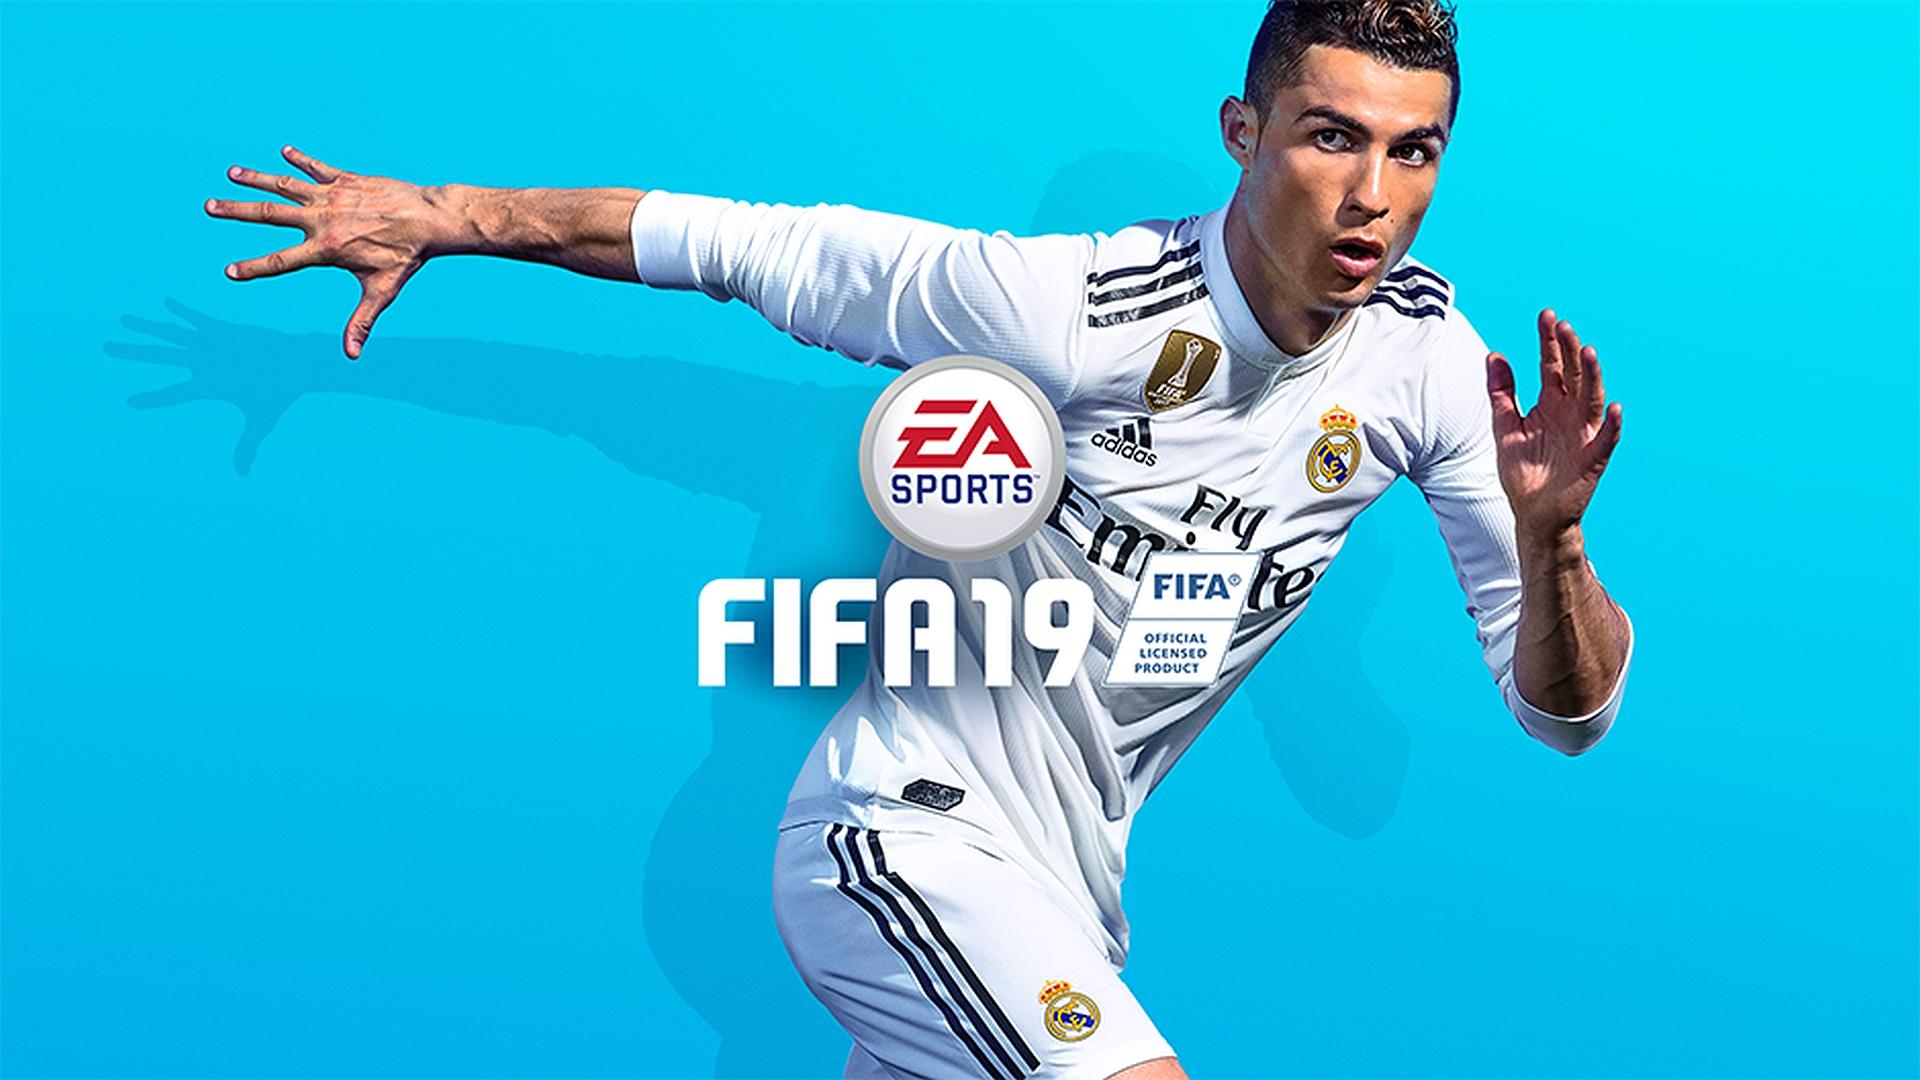 Fifa-19-cristiano-ronaldo_th1t7vxc43ml19vbx1nc86x5m